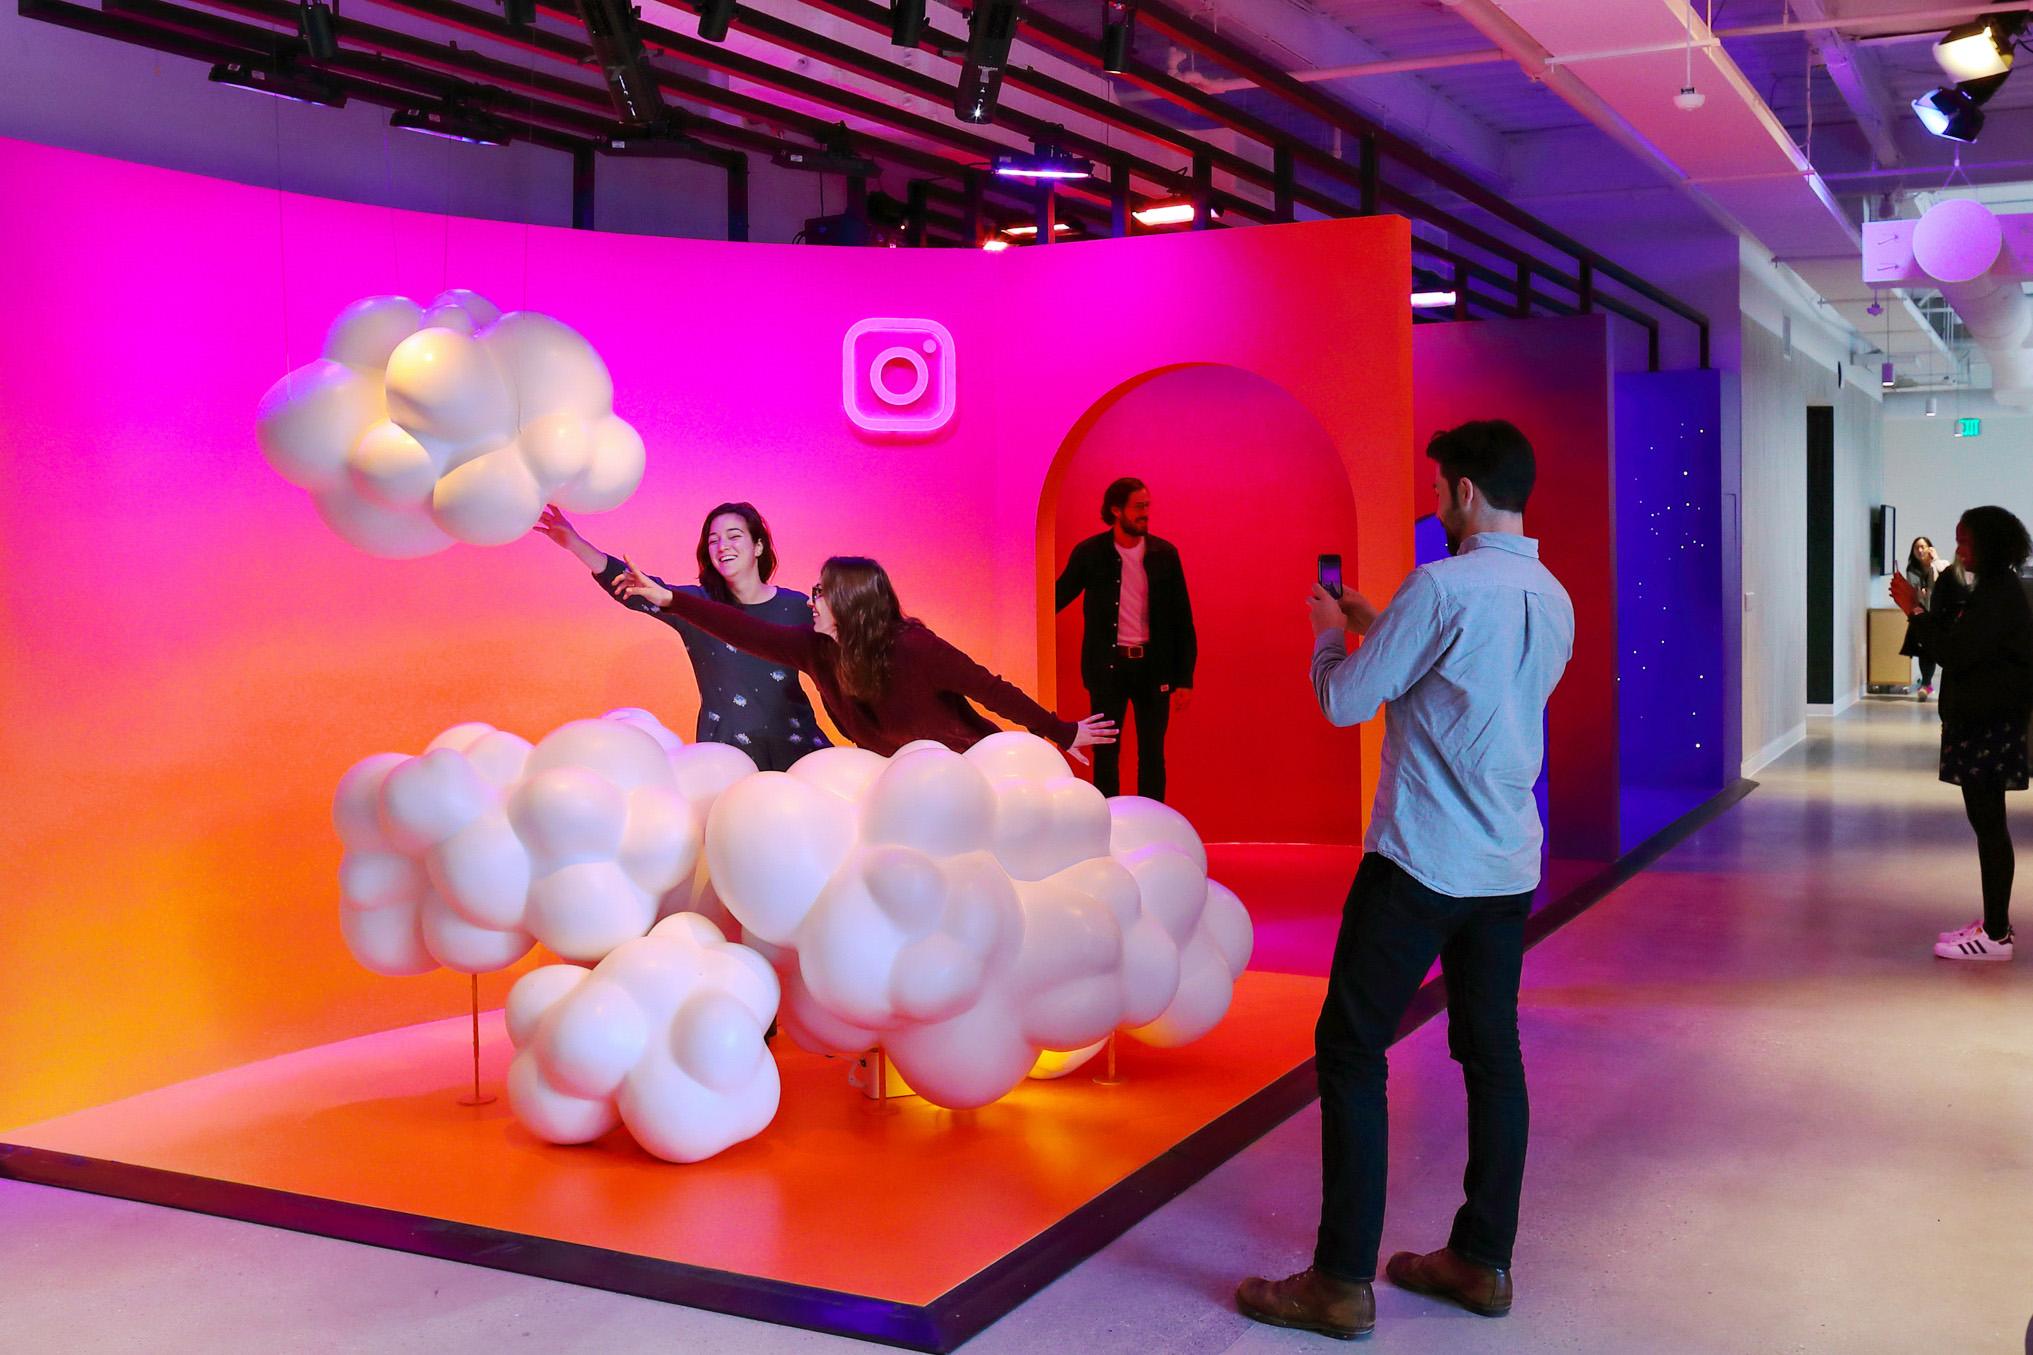 Instagram new headquarter's photo op space.